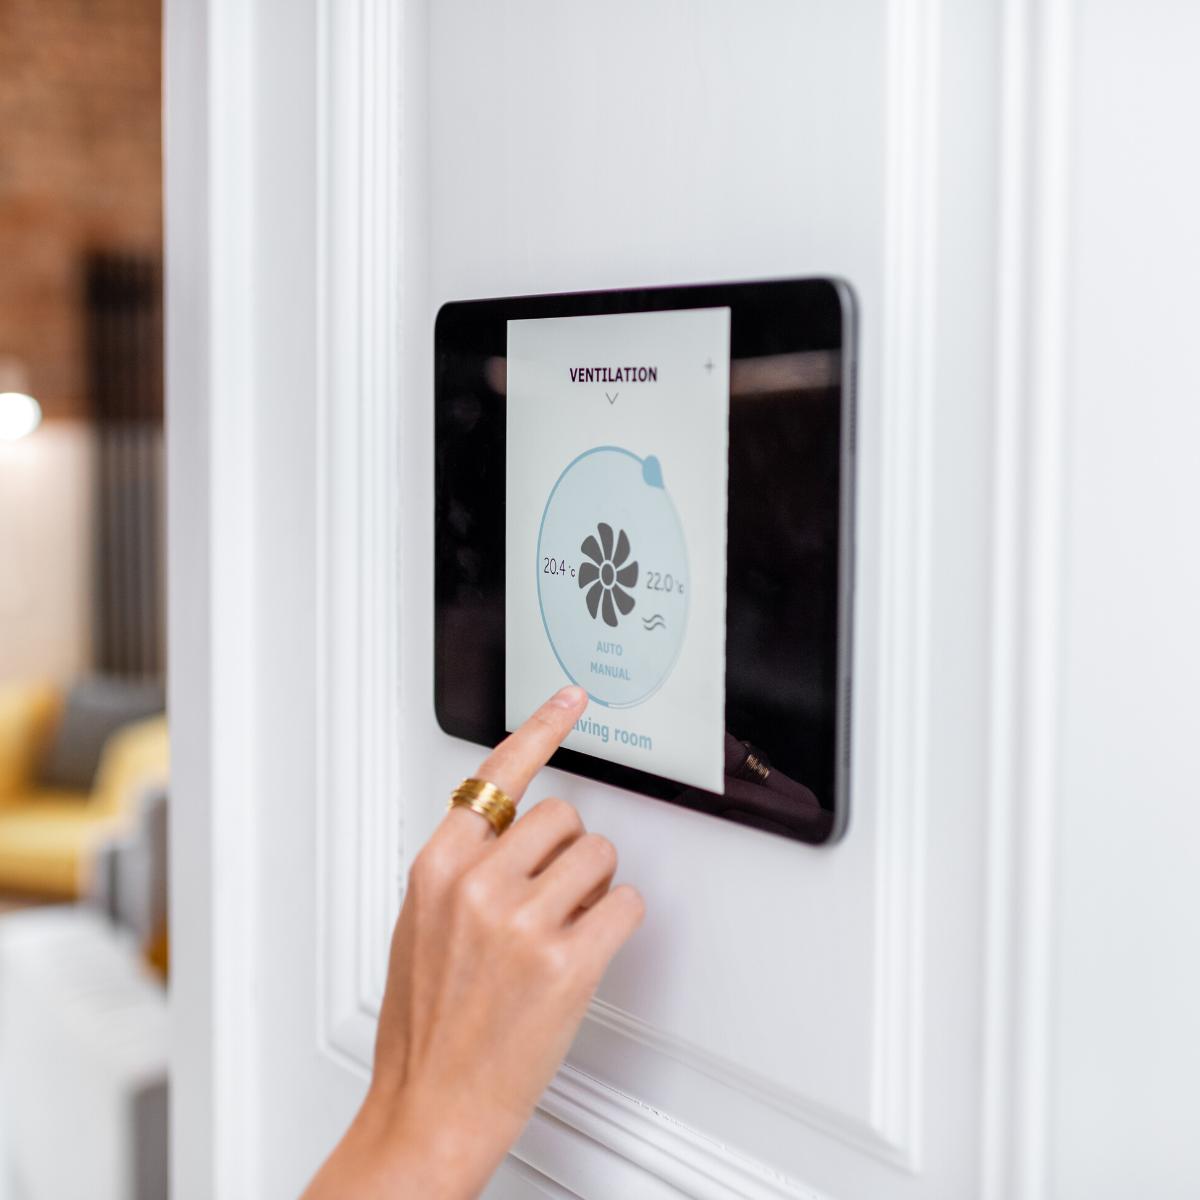 Podés controlar tu hogar desde el celular o una tablet, donde quiera que estés.